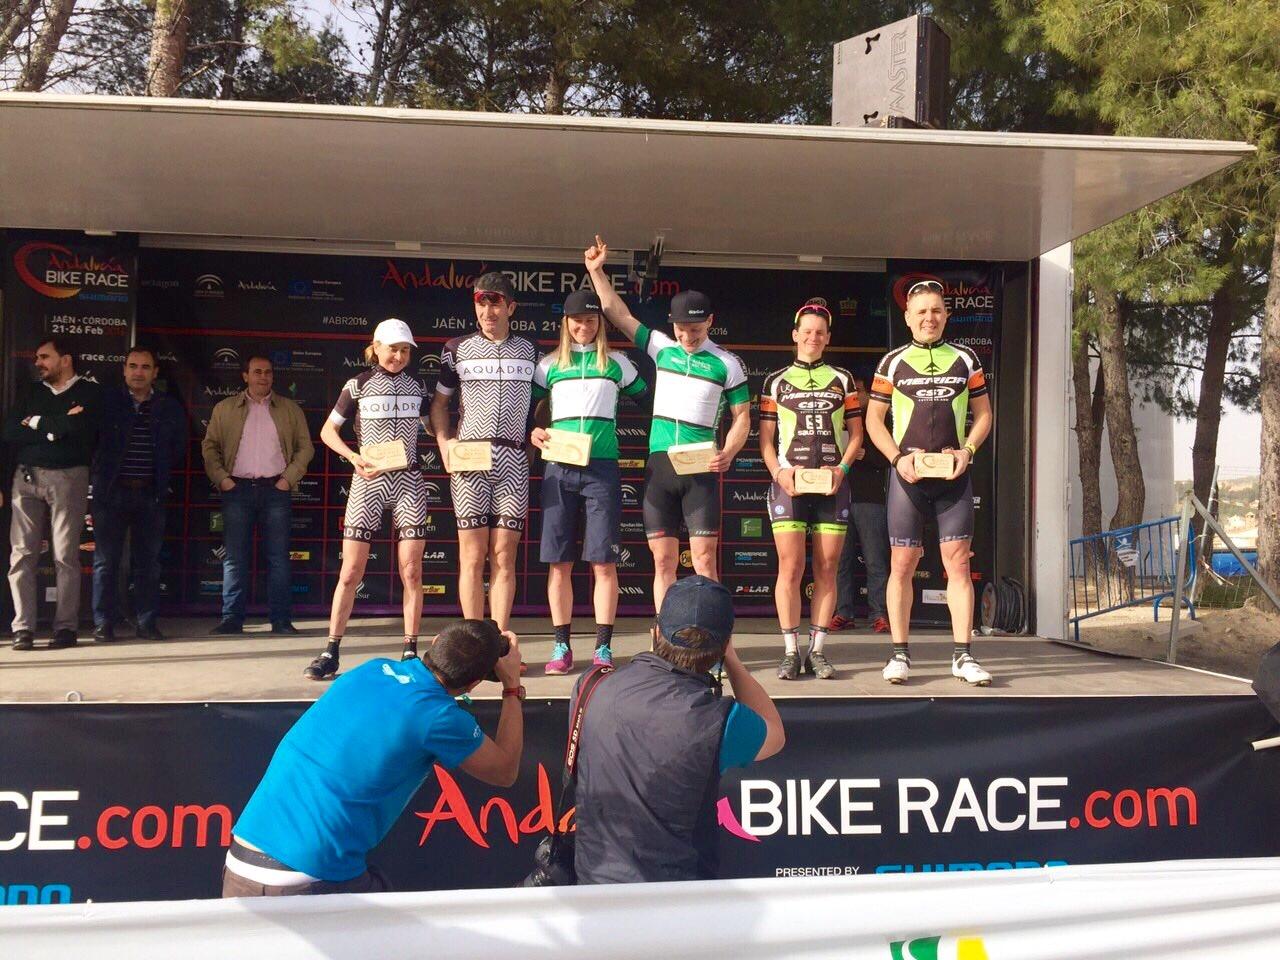 andalucia_bike_race_team_cst_bikemag1